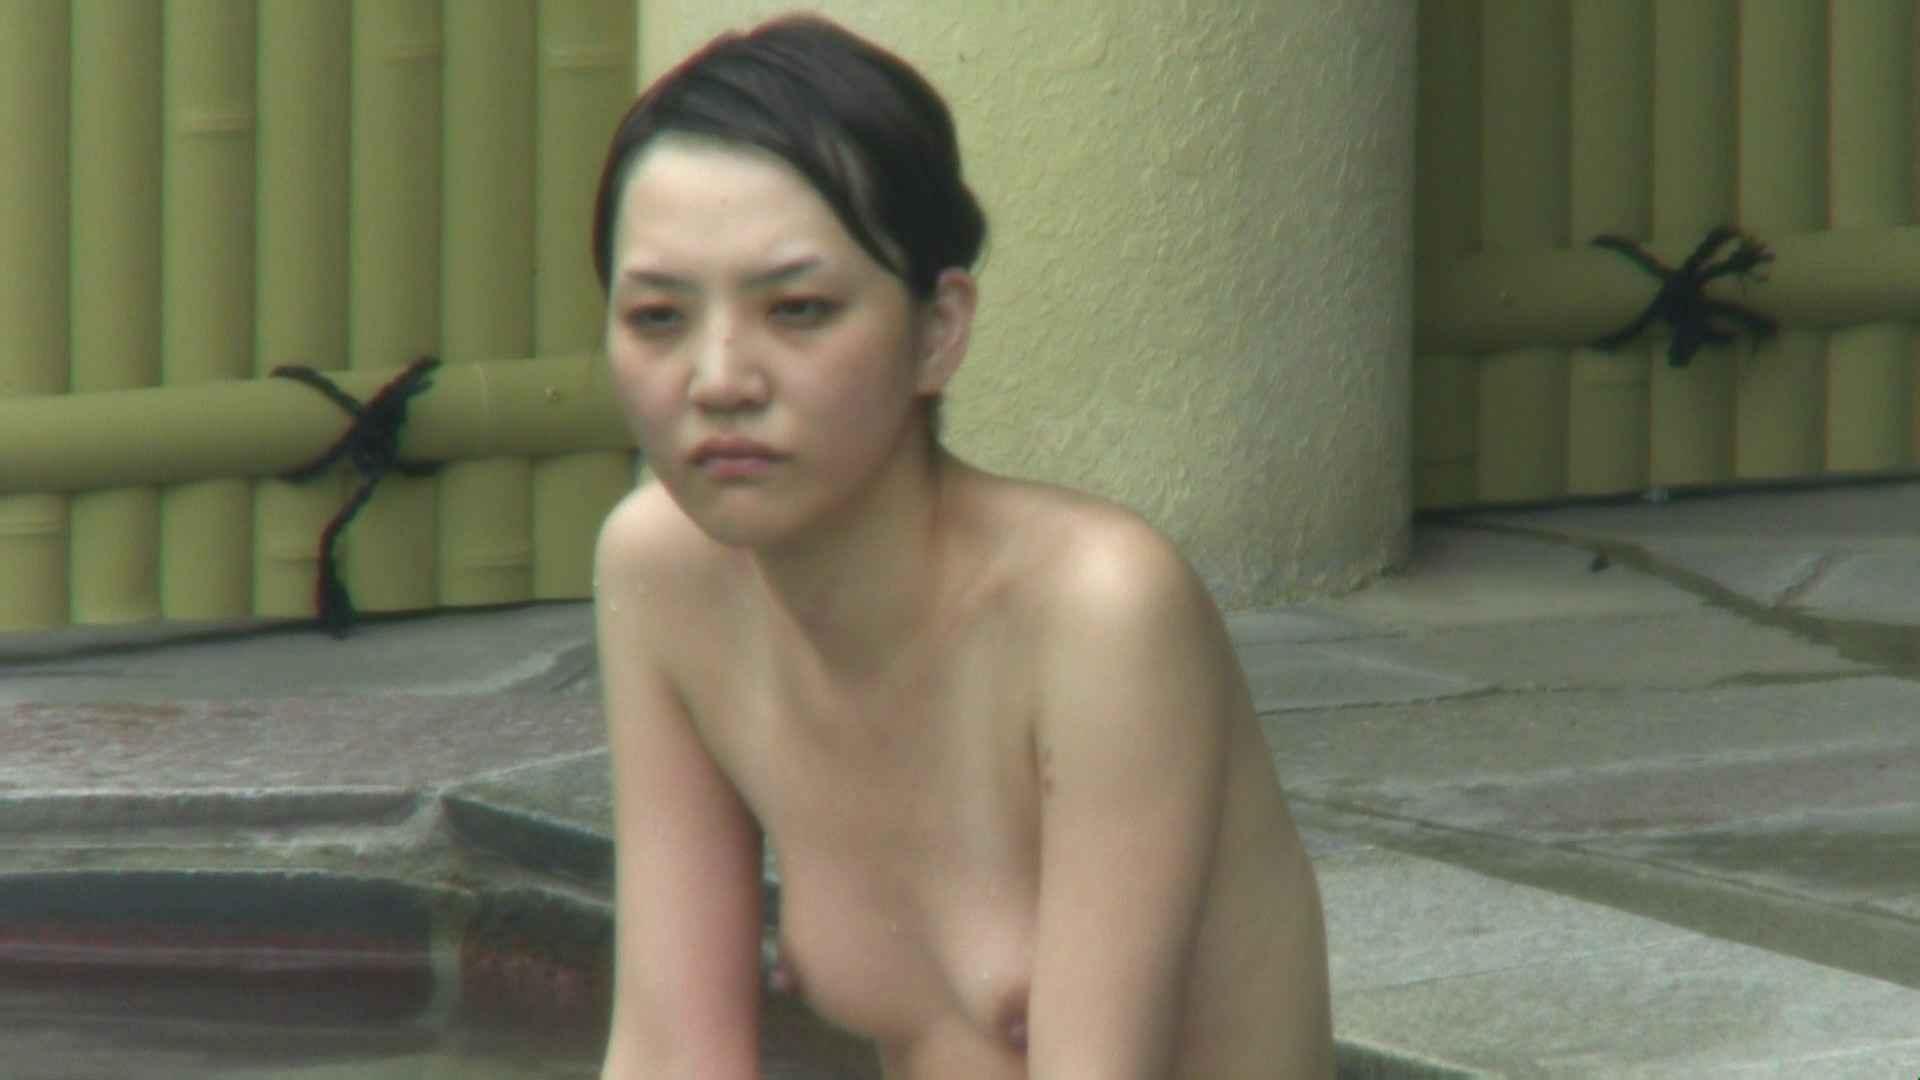 Aquaな露天風呂Vol.64【VIP限定】 露天風呂編  78PIX 4